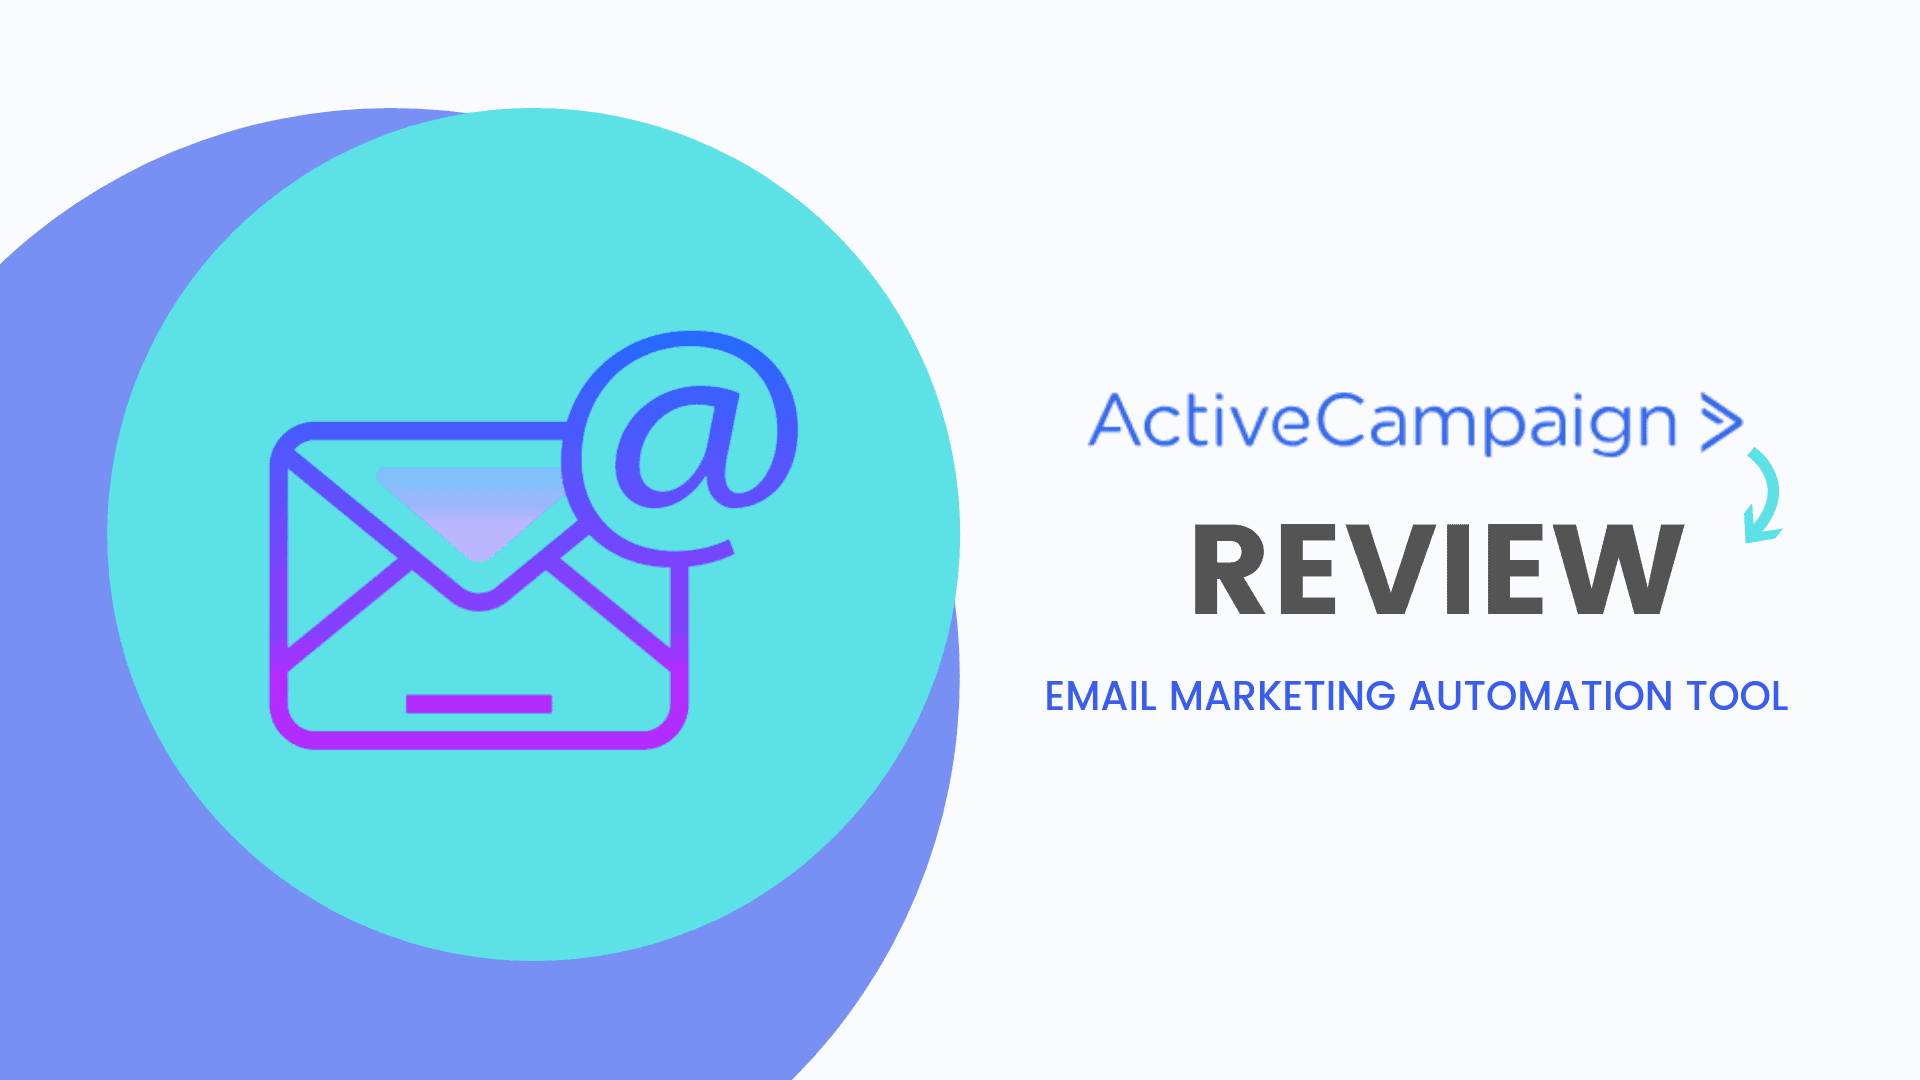 ActiveCampaign Review 2019